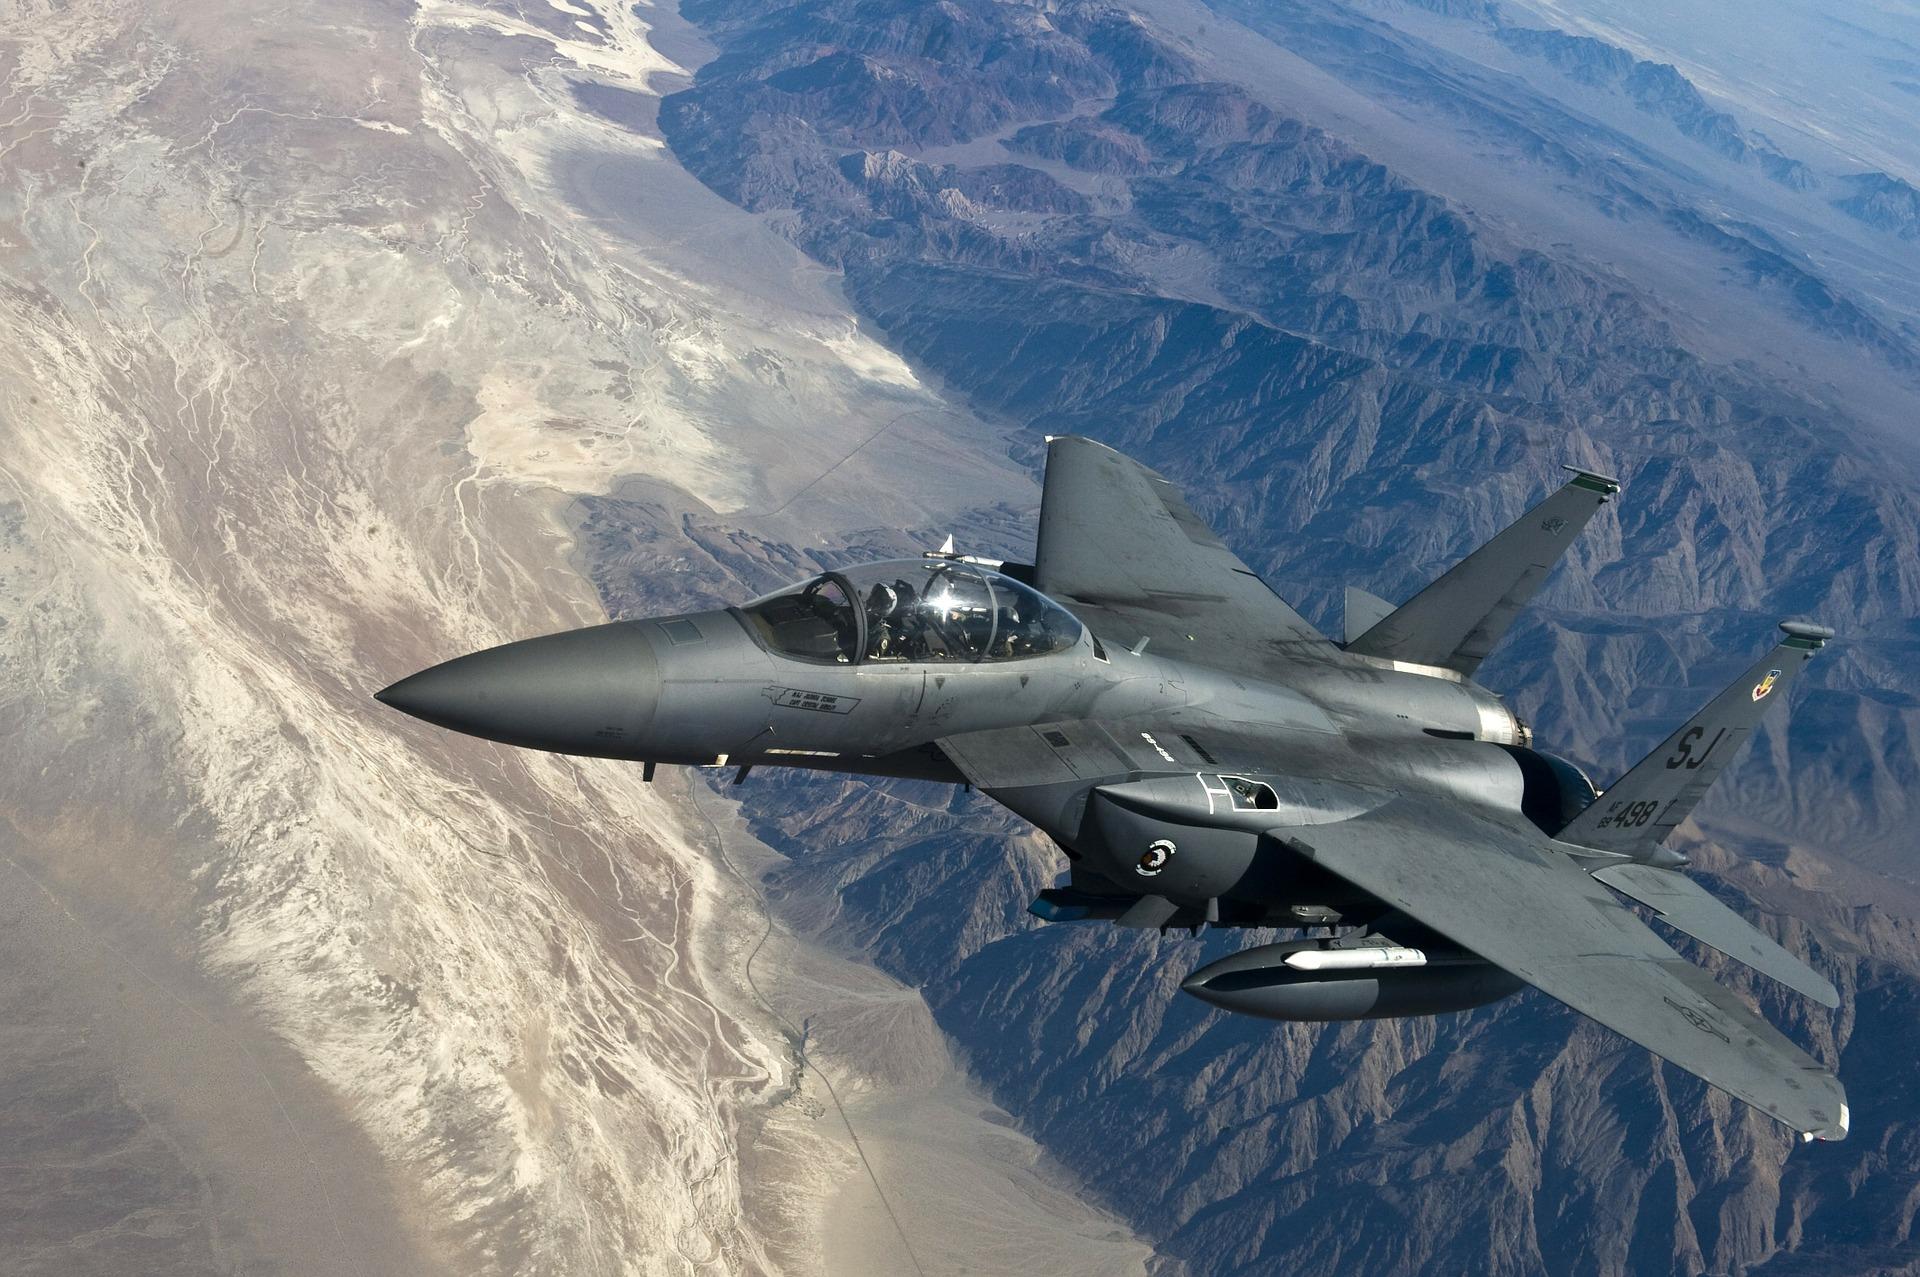 fighter-jet-63090_1920.jpg